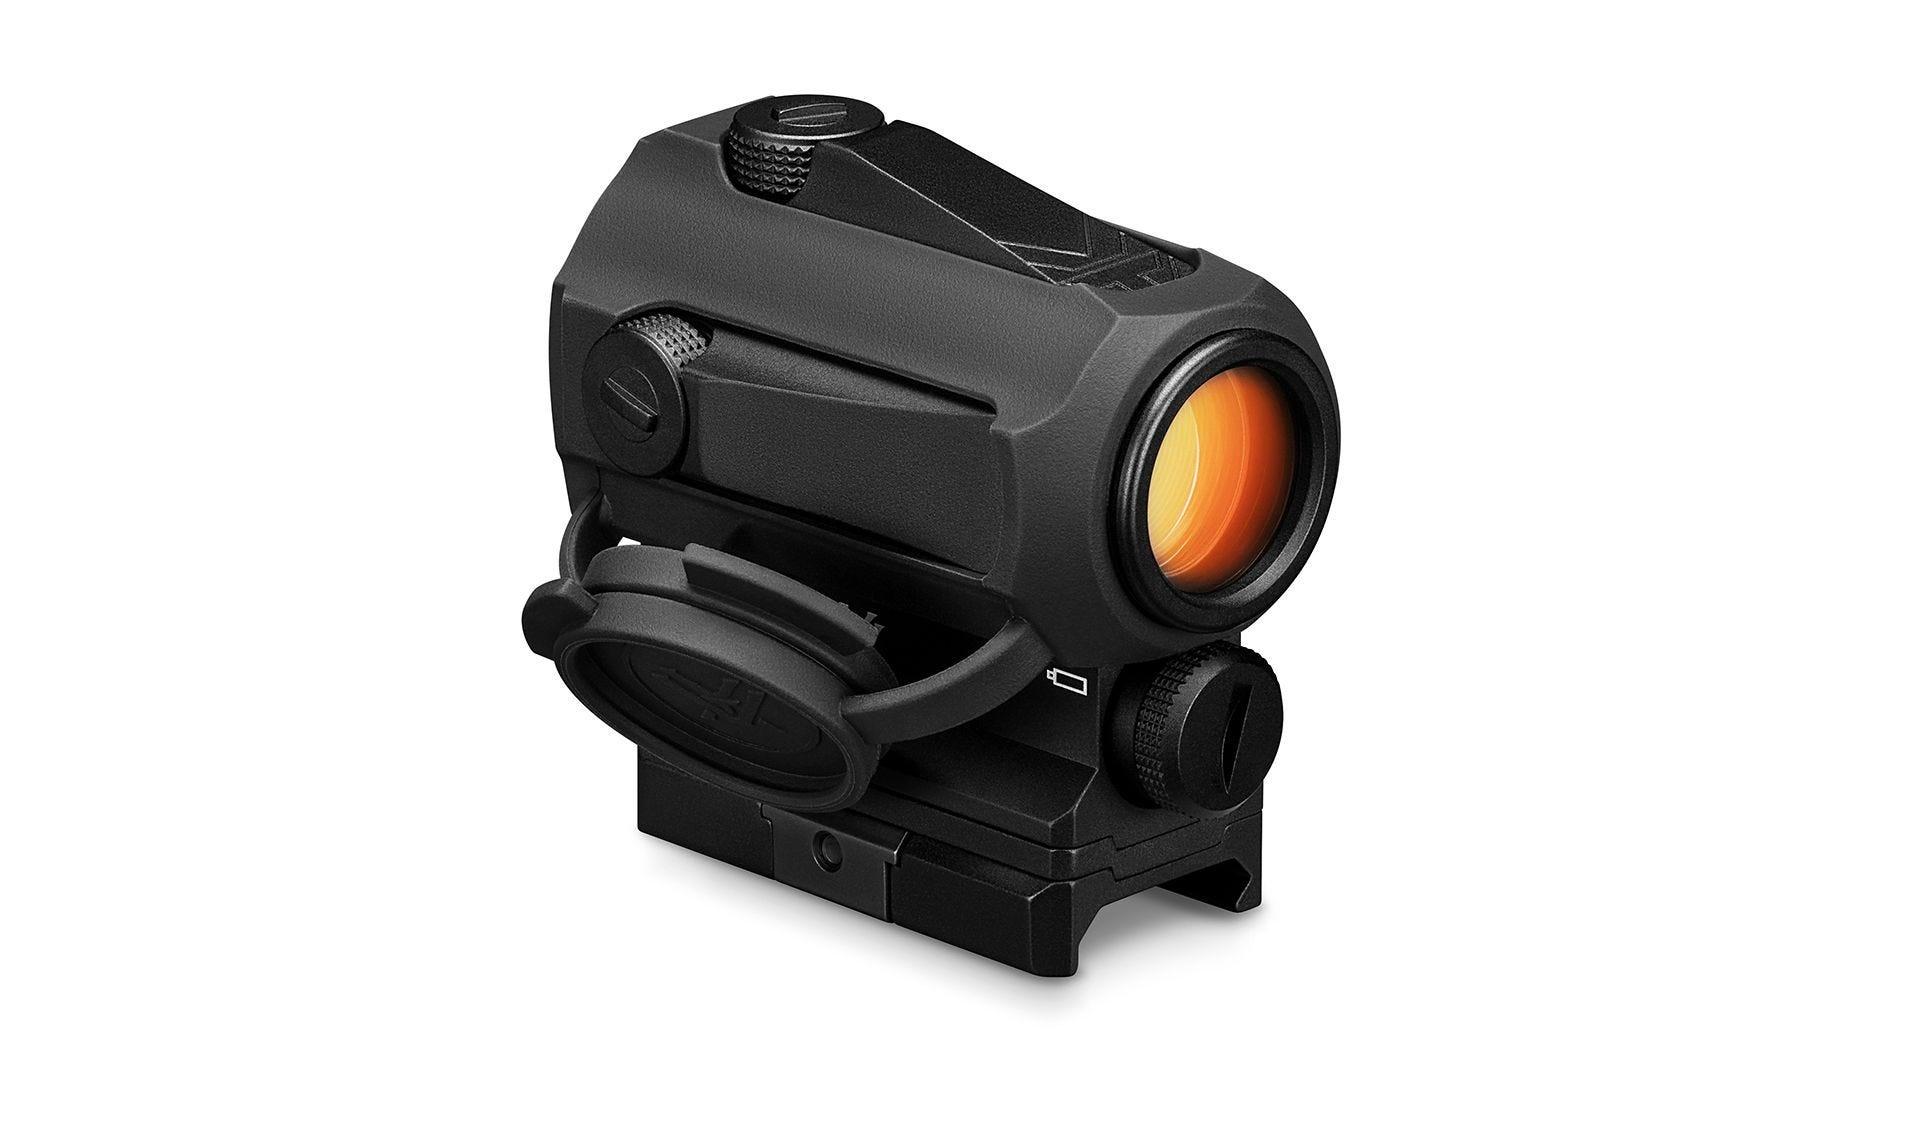 Vortex Vortex - SPARC AR Red Dot 2 MOA LED Upgrade Black